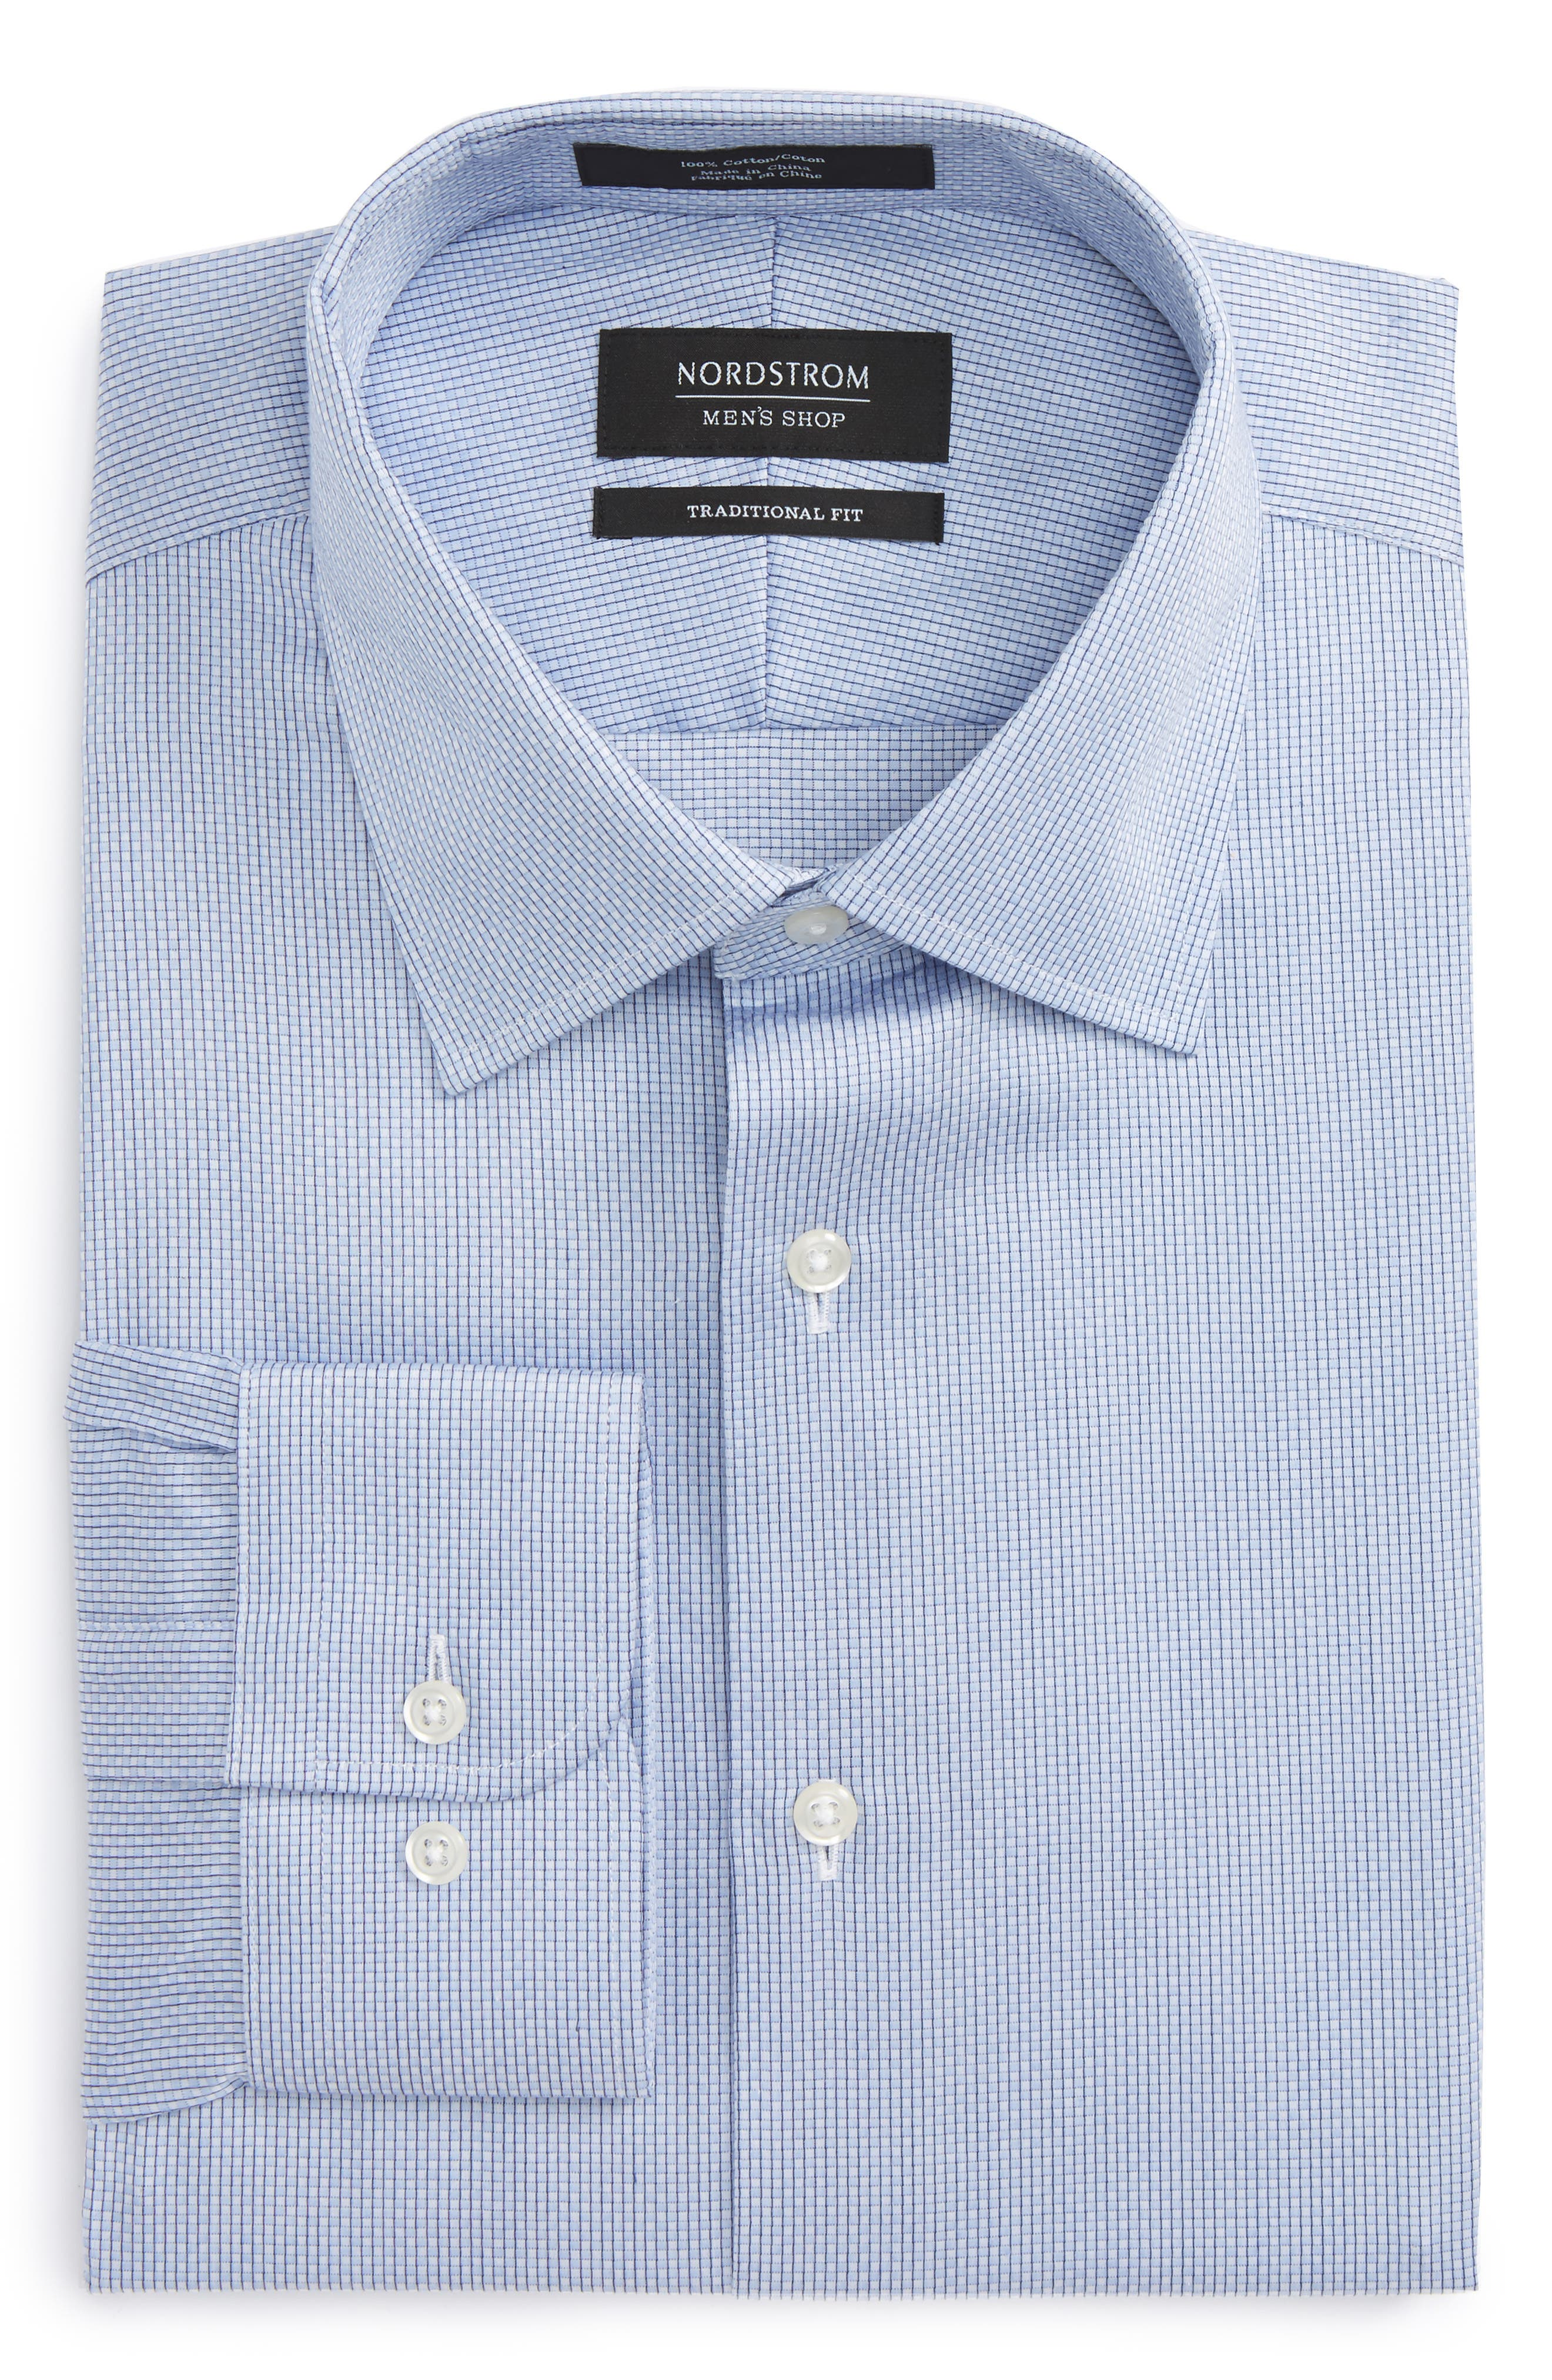 Main Image - Nordstrom Men's Shop Traditional Fit Stripe Dress Shirt